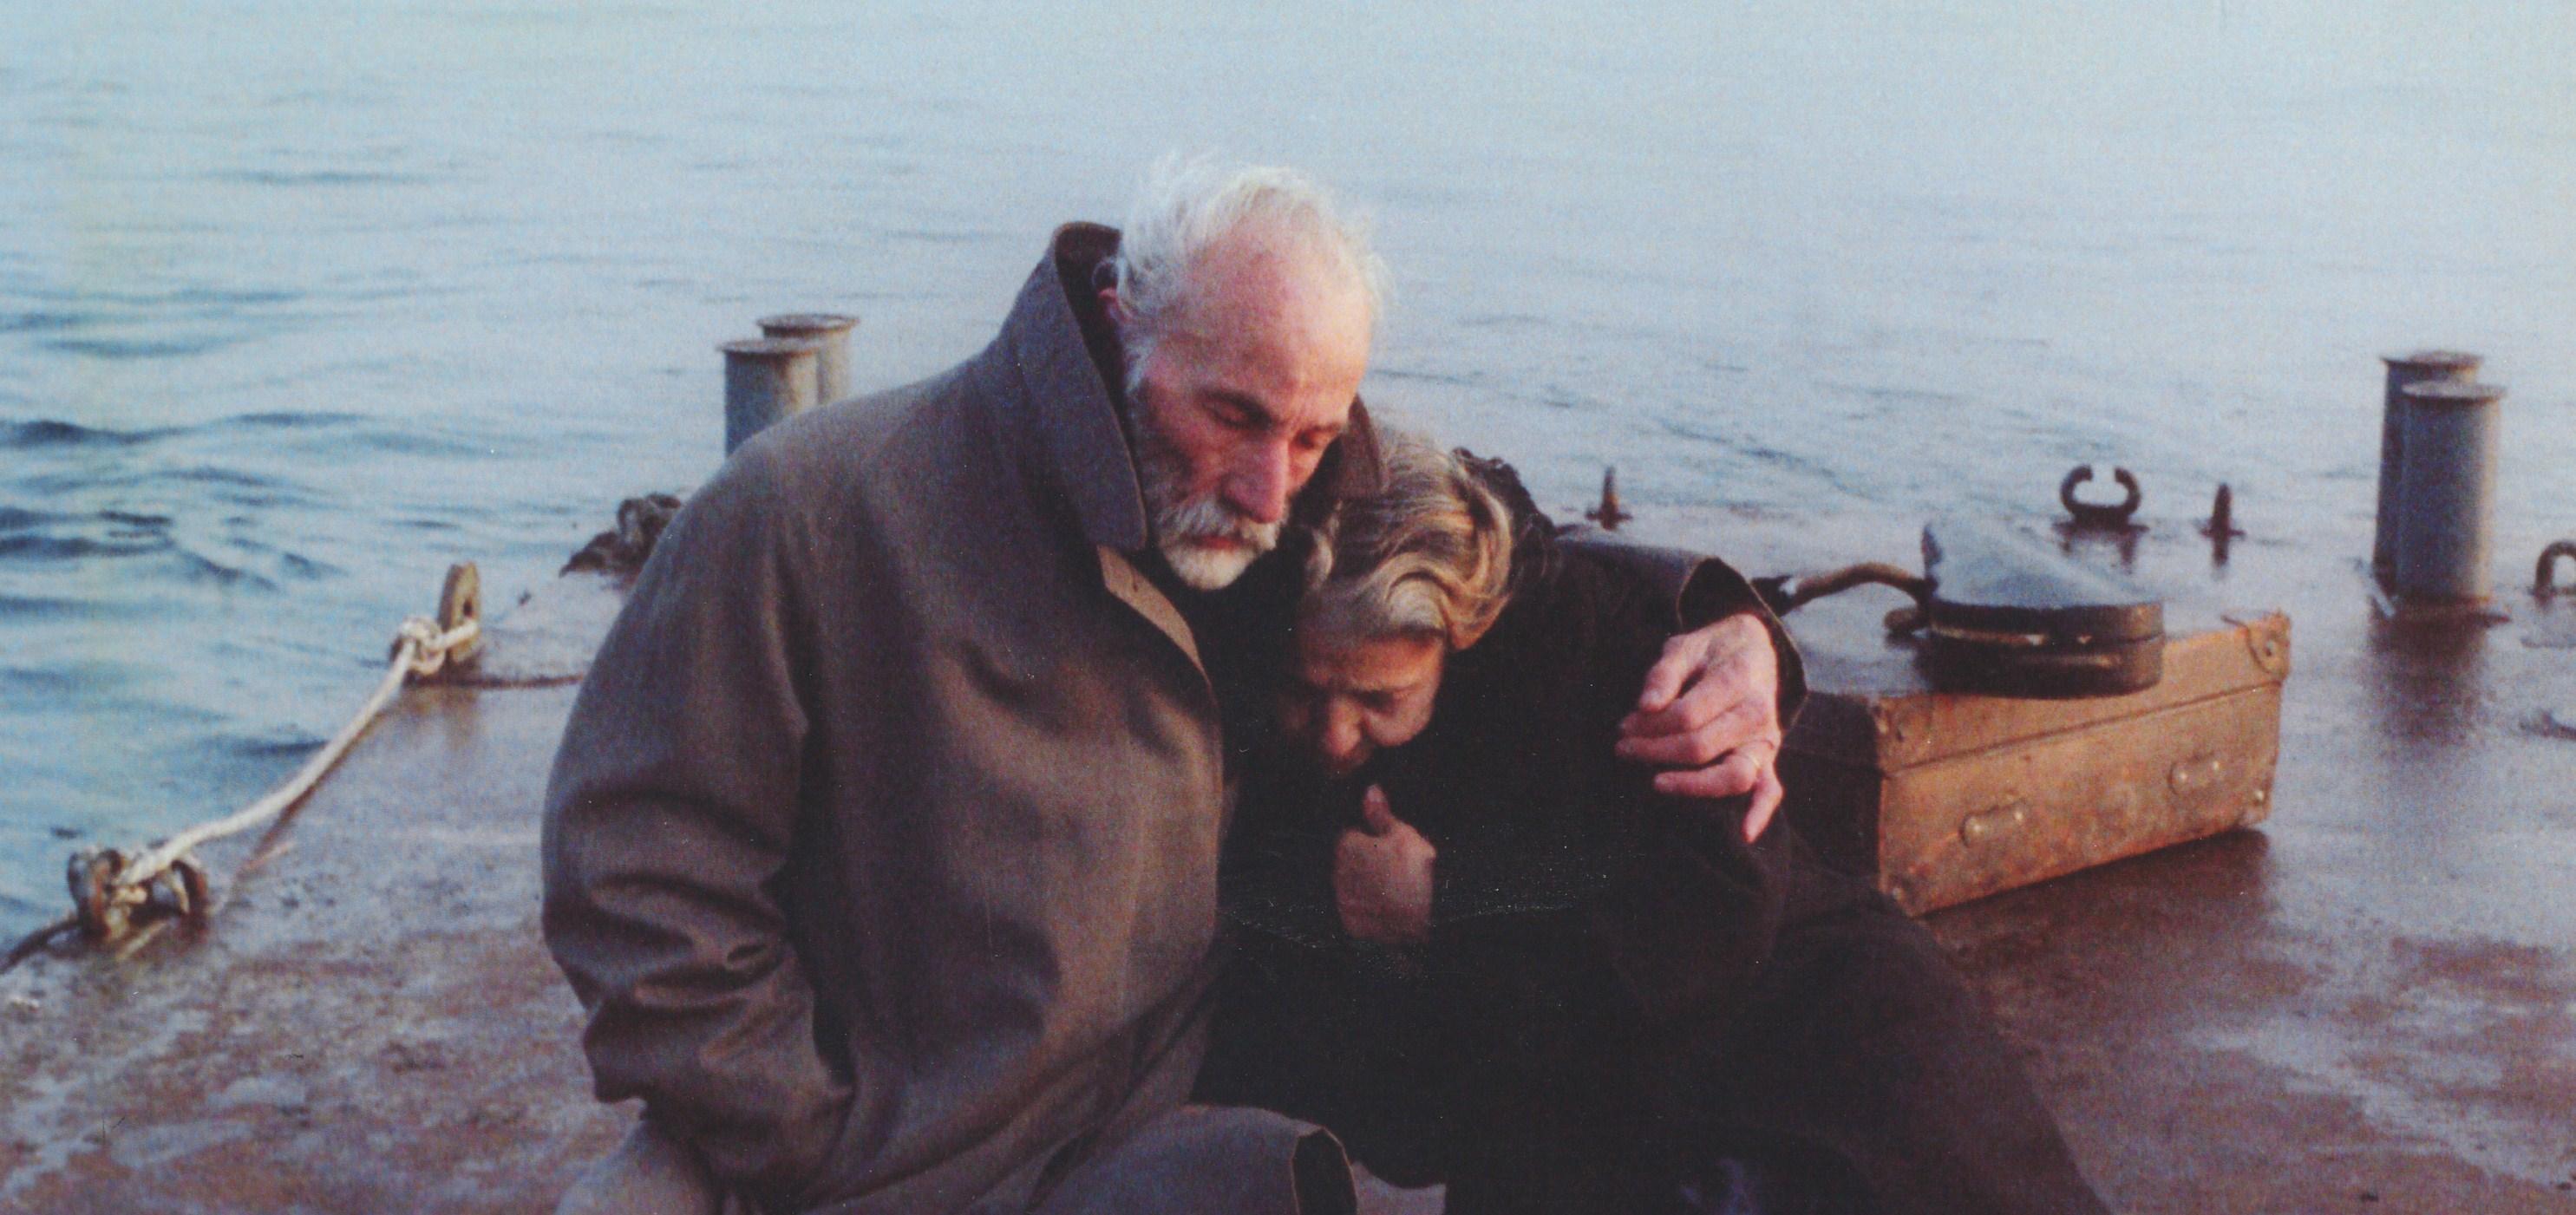 http://media.paperblog.fr/i/392/3922424/critique-dvd-voyage-cythere-L-kKH3BQ.jpeg